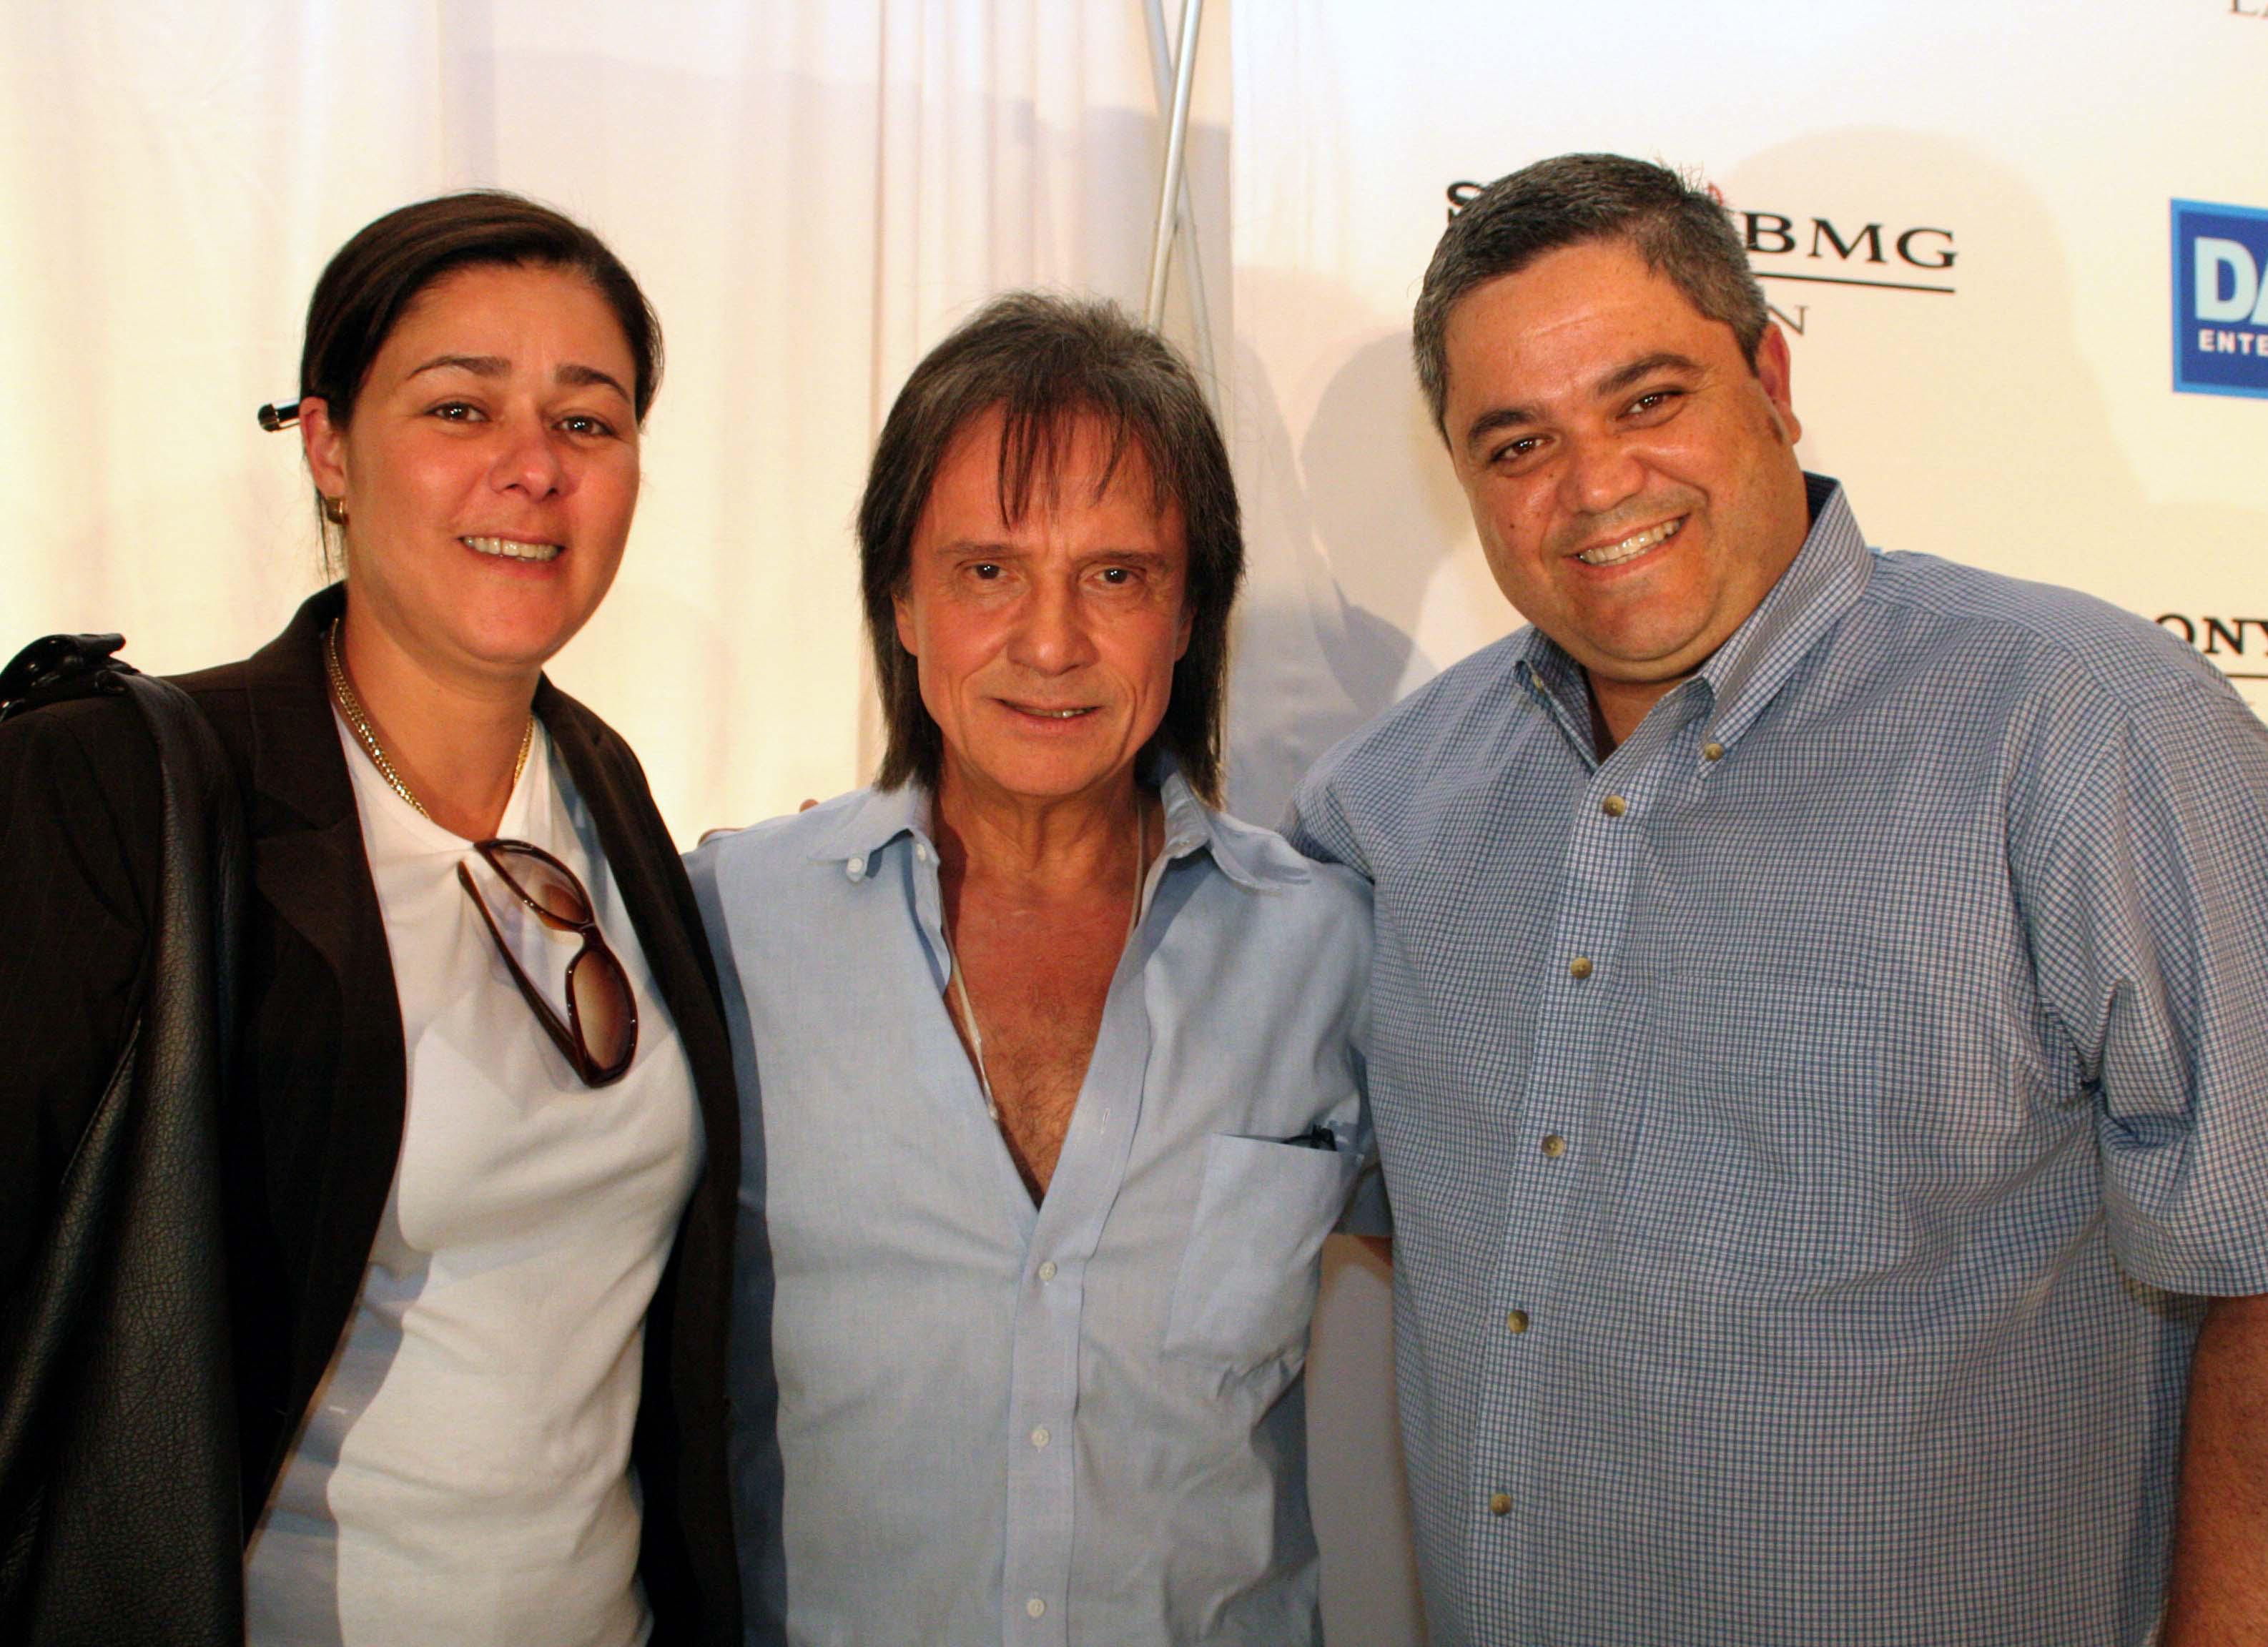 Ana e Antonio Martins